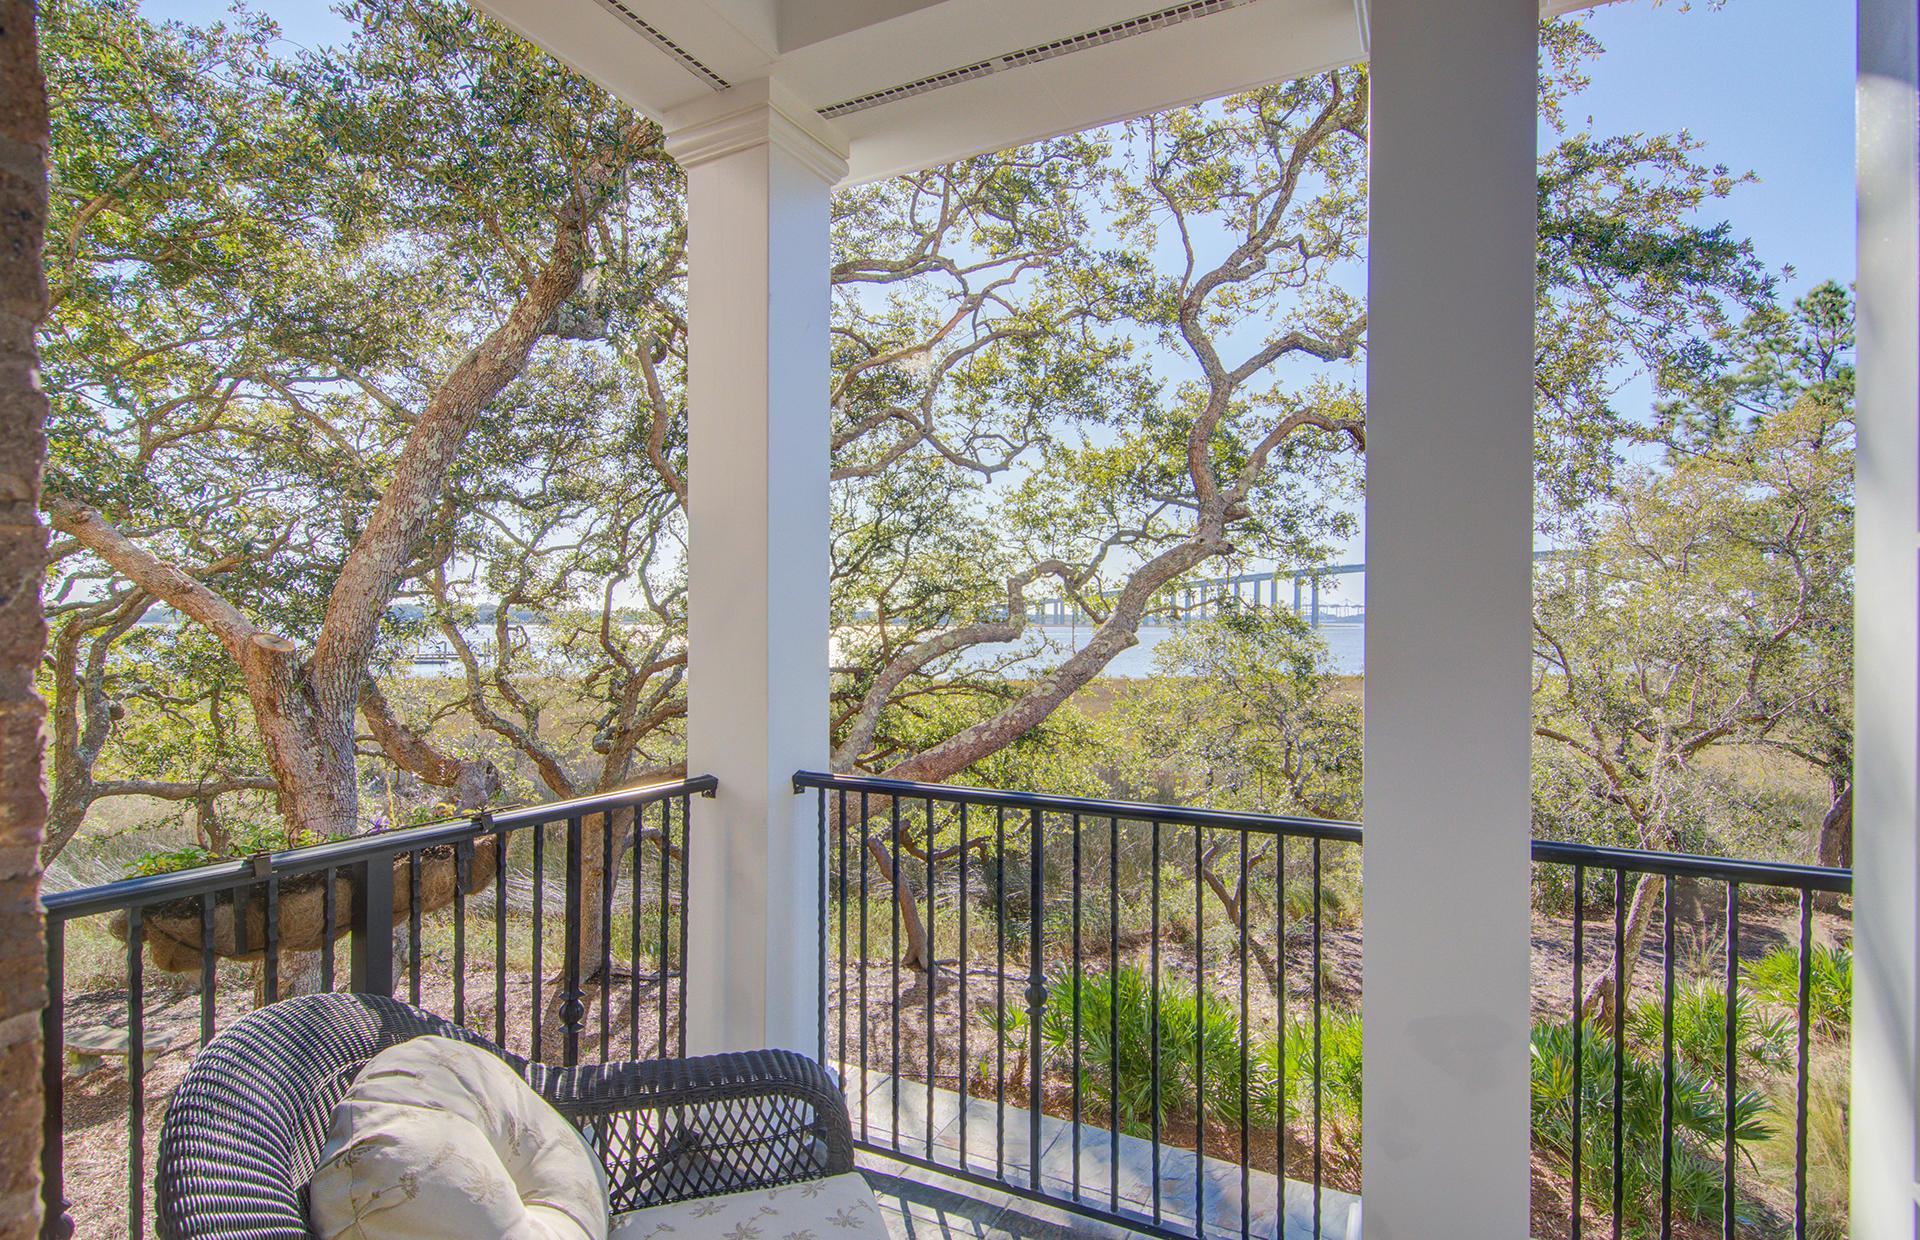 Daniel Island Homes For Sale - 134 Fairbanks Oak, Charleston, SC - 12